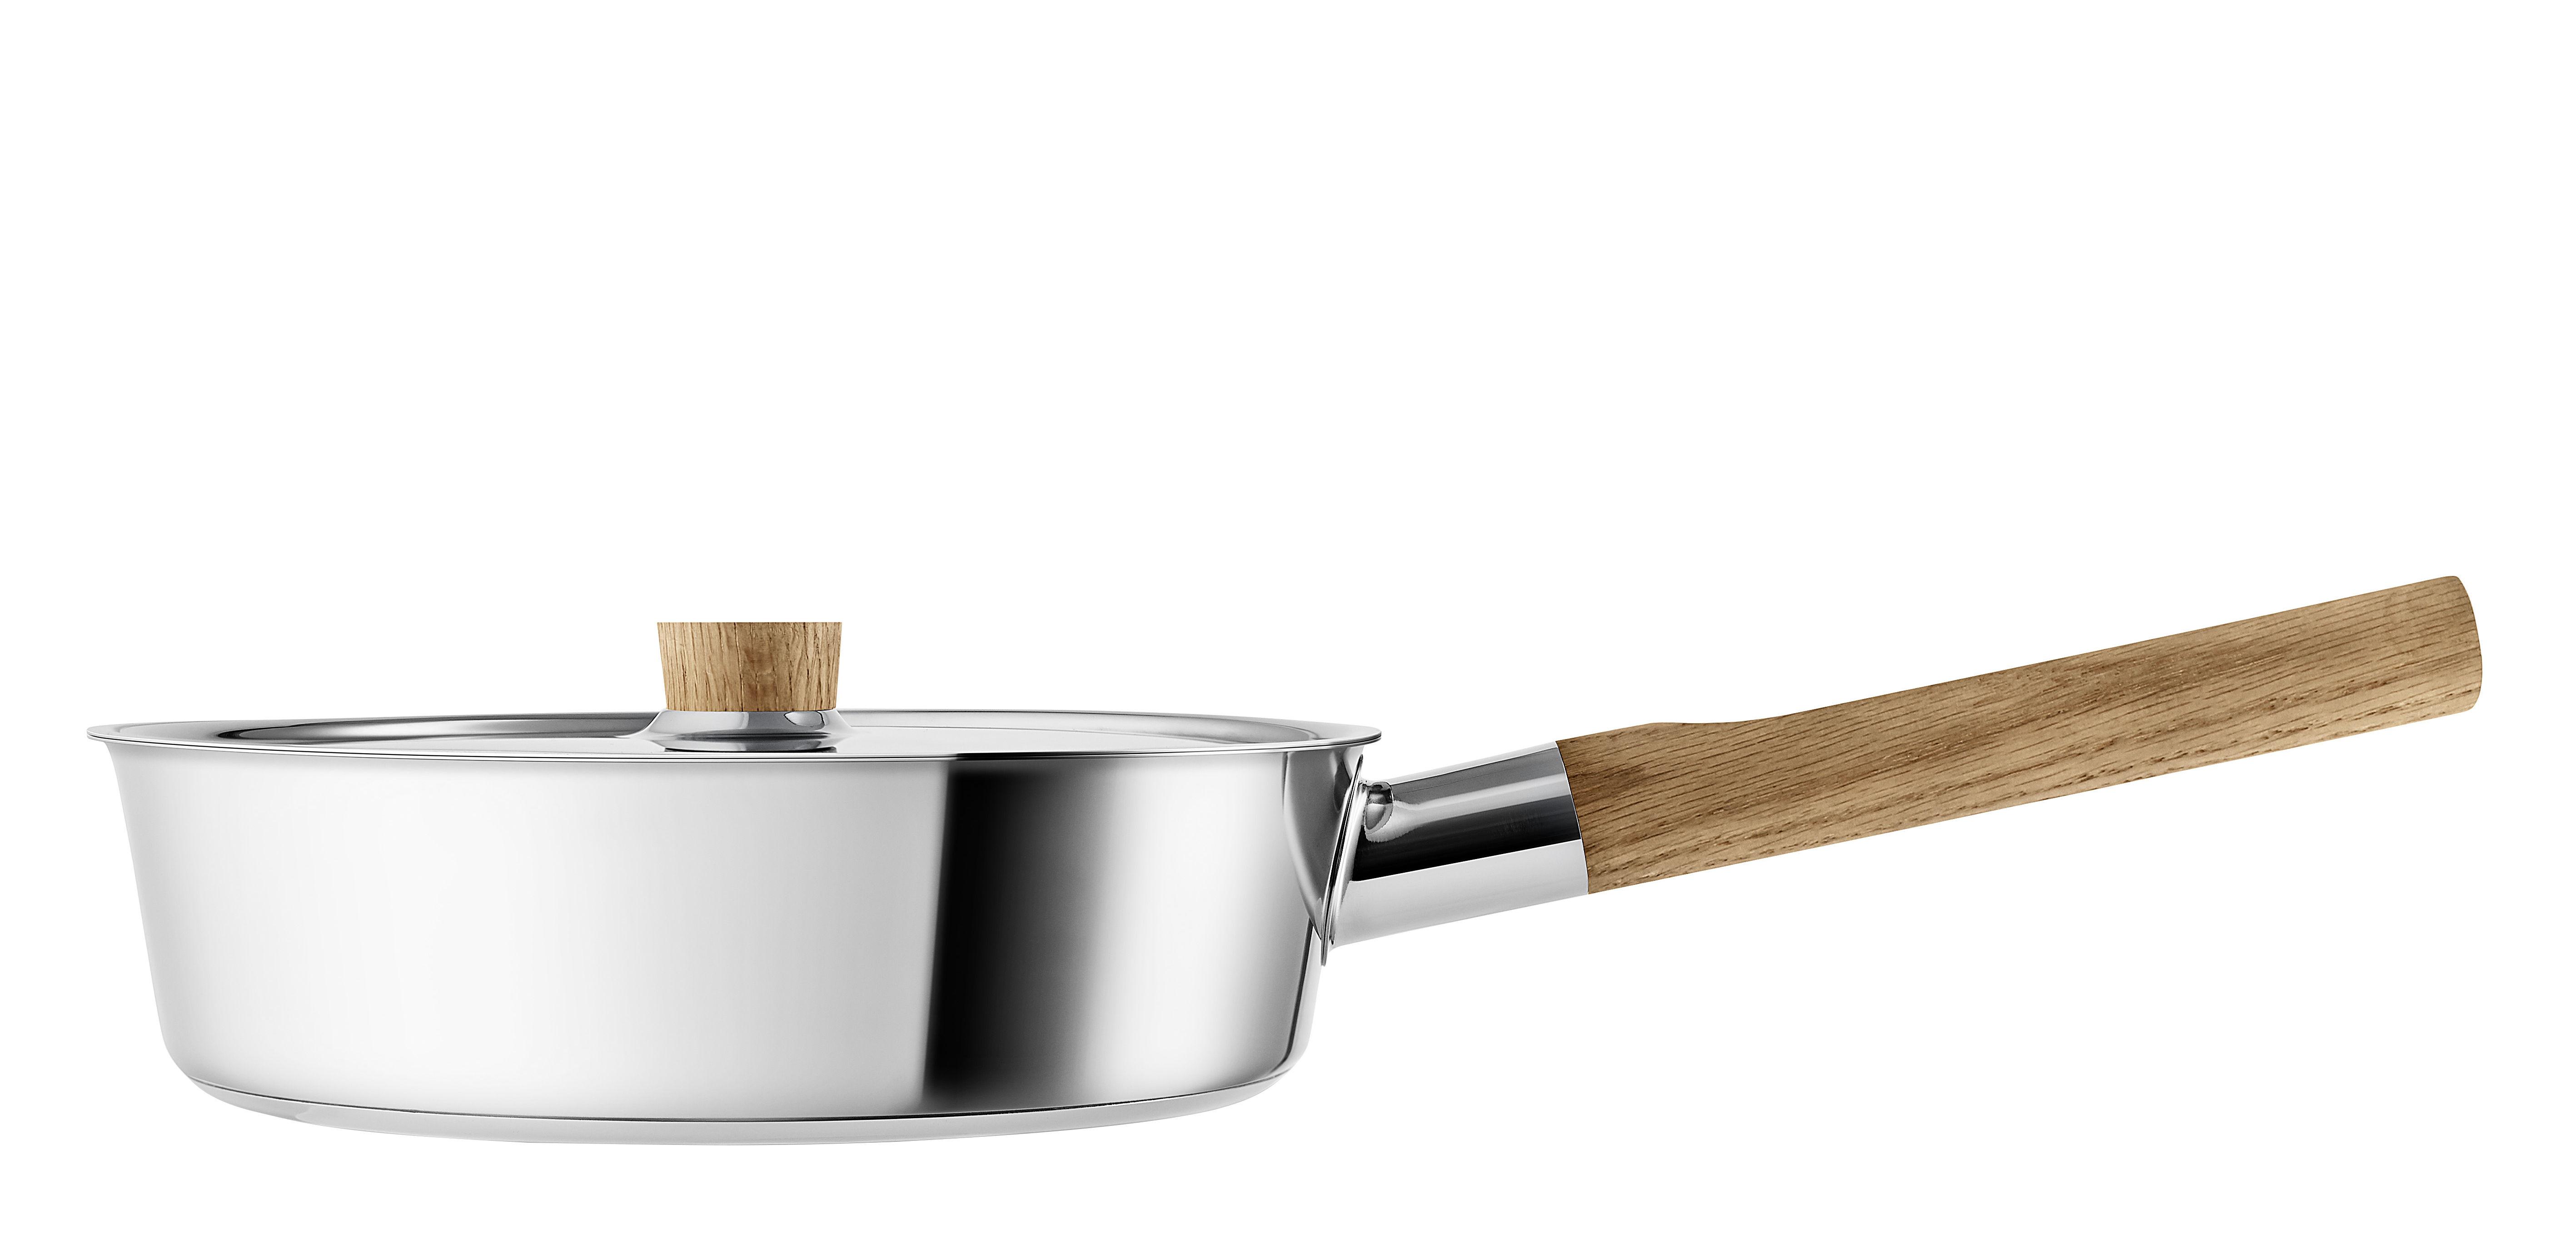 Kitchenware - Pots & Pans - Nordic Kitchen Casserole - / Ø 24 cm - With lid by Eva Solo - Stainless steel / Oak - Oak, Stainless steel